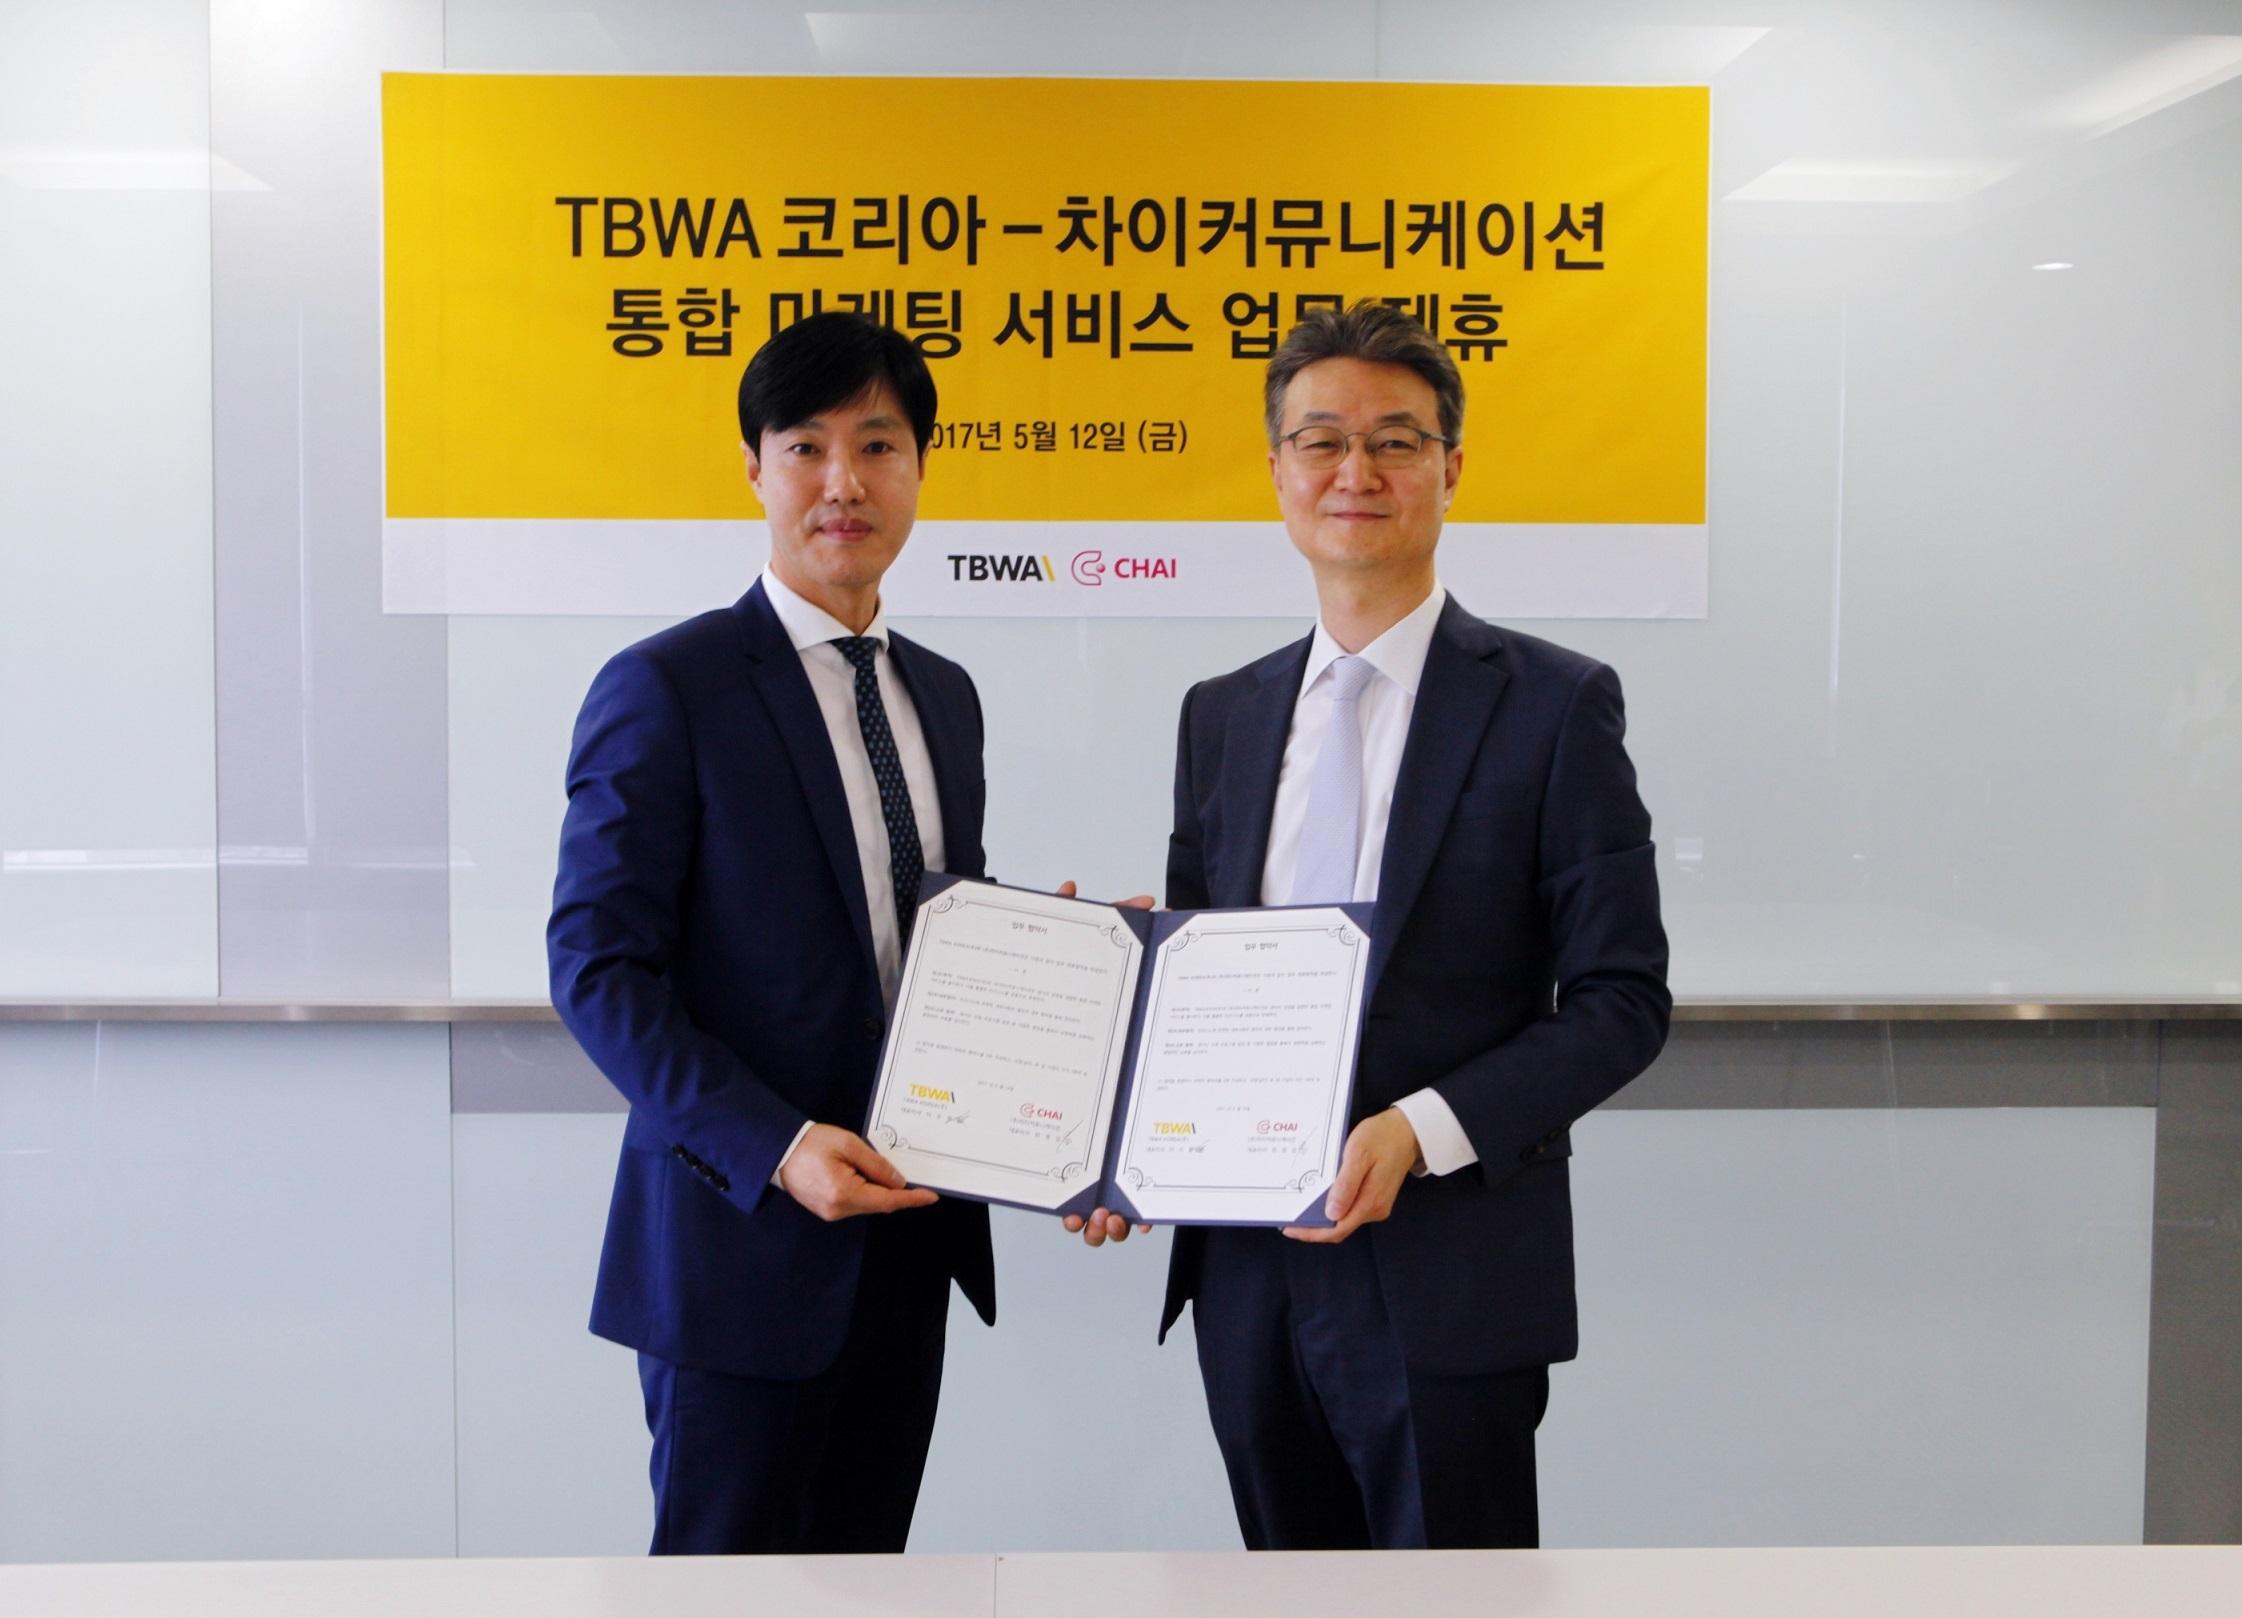 TBWA코리아, 차이커뮤니케이션과 통합 마케팅 서비스 'AD Circle' 출시